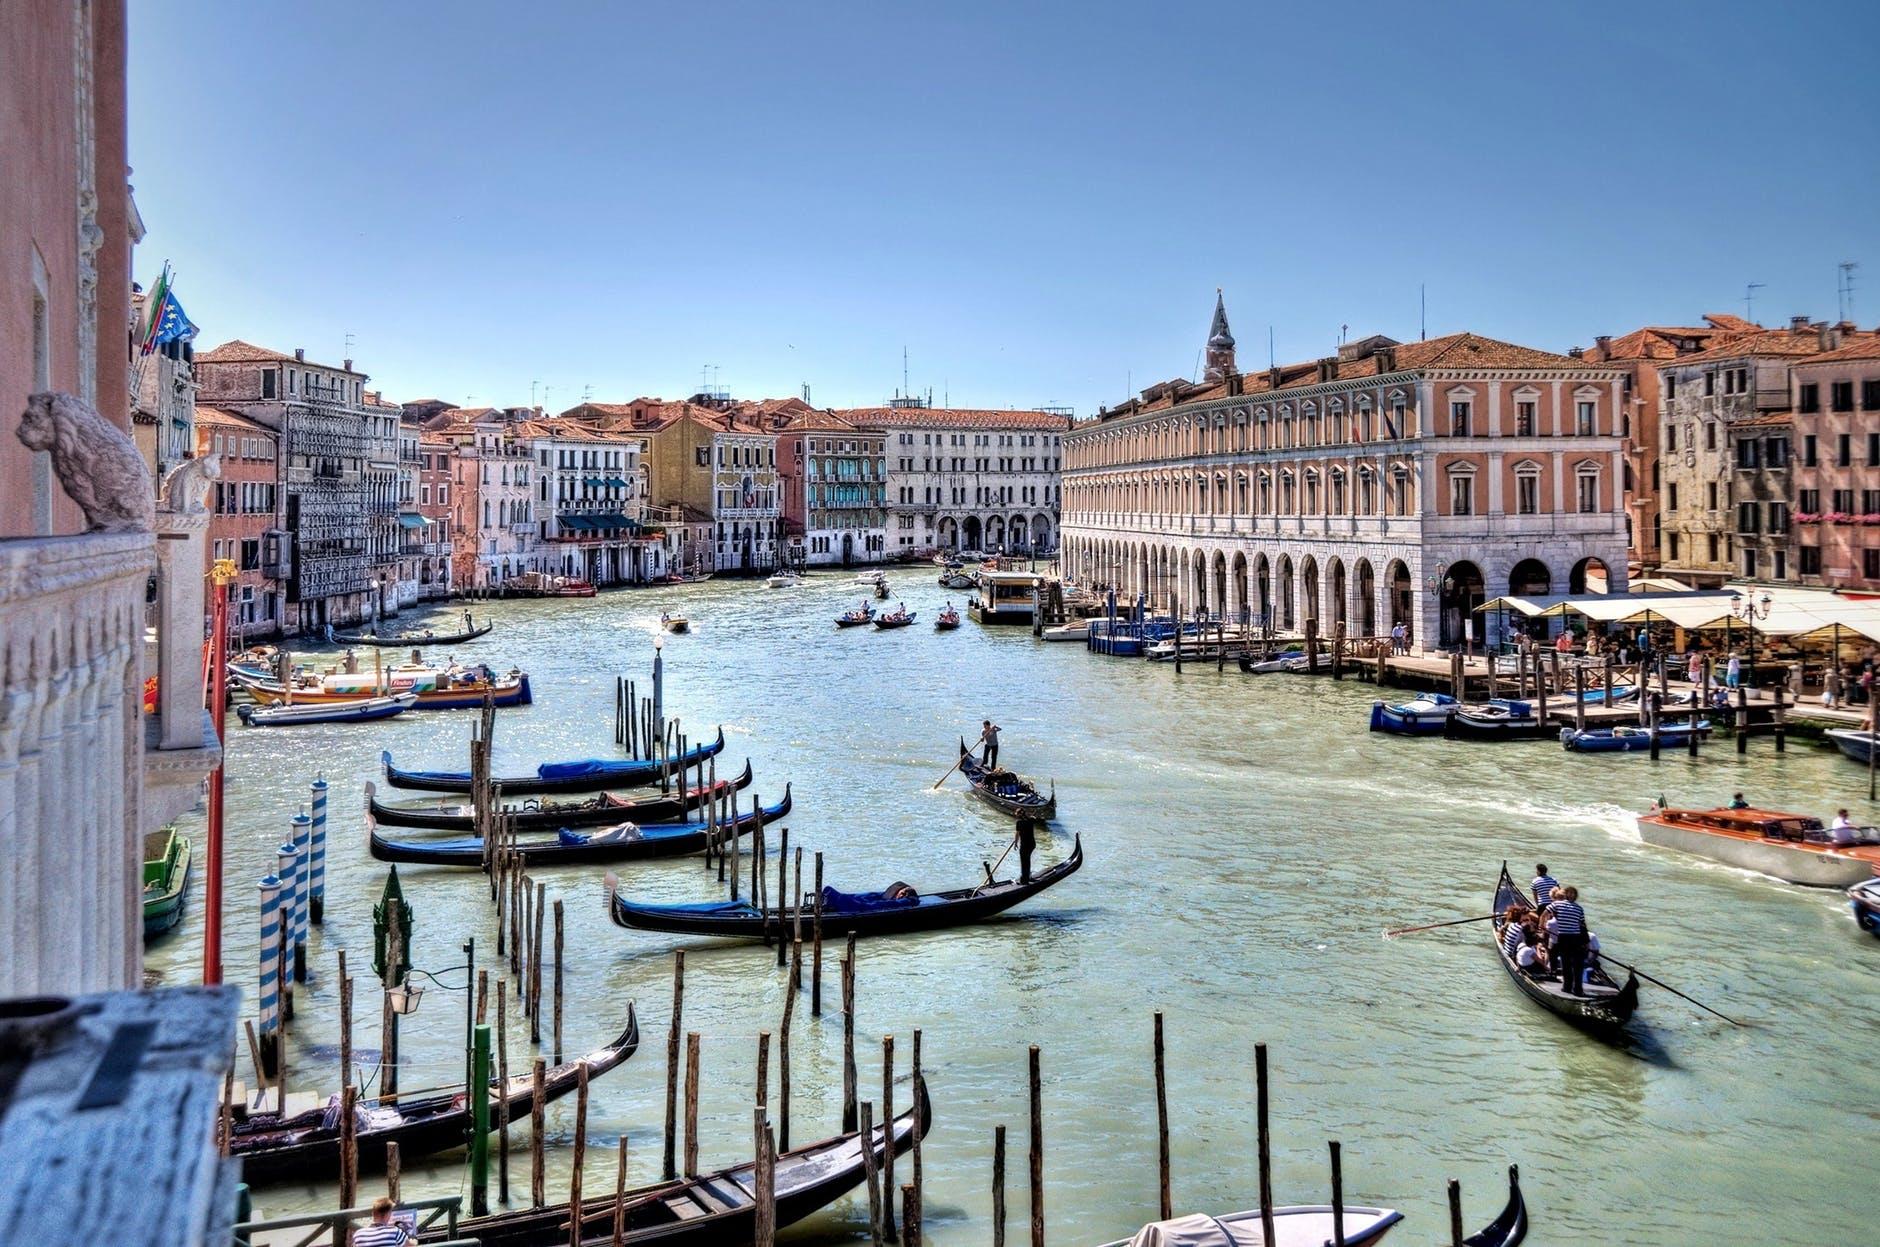 venice-grand-canal-water-boats-161850.jpeg